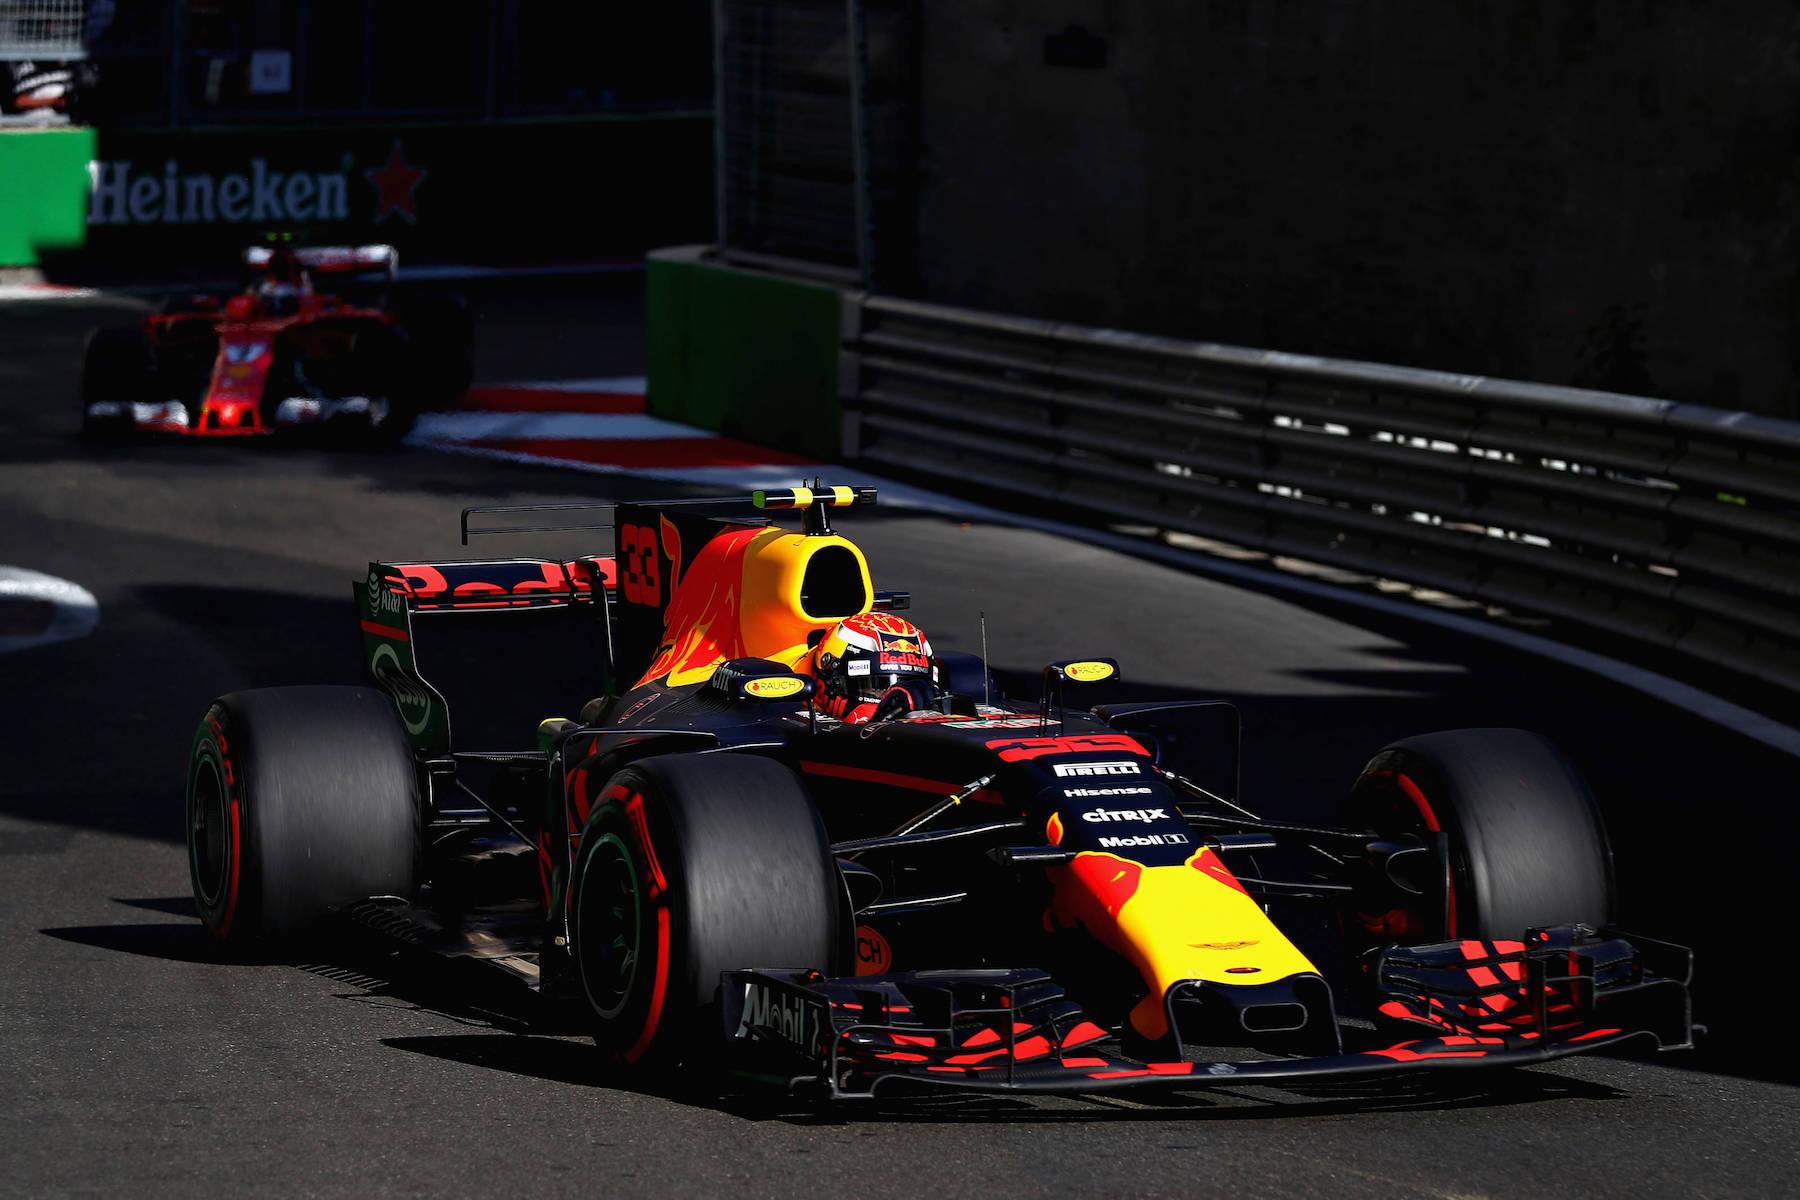 G 2017 Max Verstappen | Red Bull RB13 | 2017 Azerbaijan GP DNF 1 copy.jpg